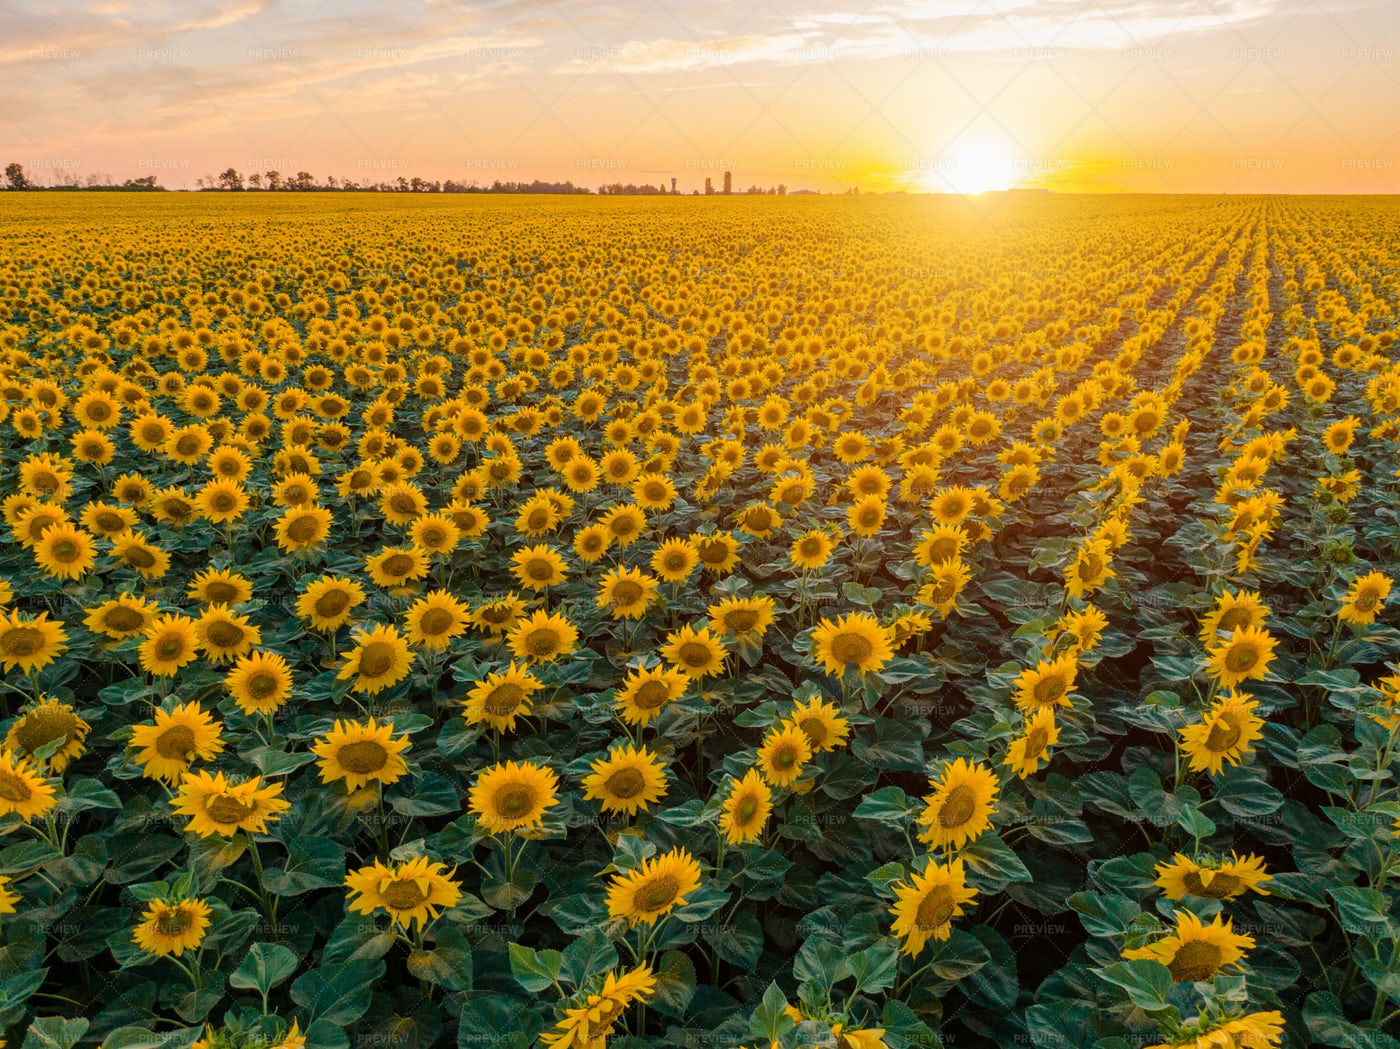 Rows Of Sunflowers: Stock Photos